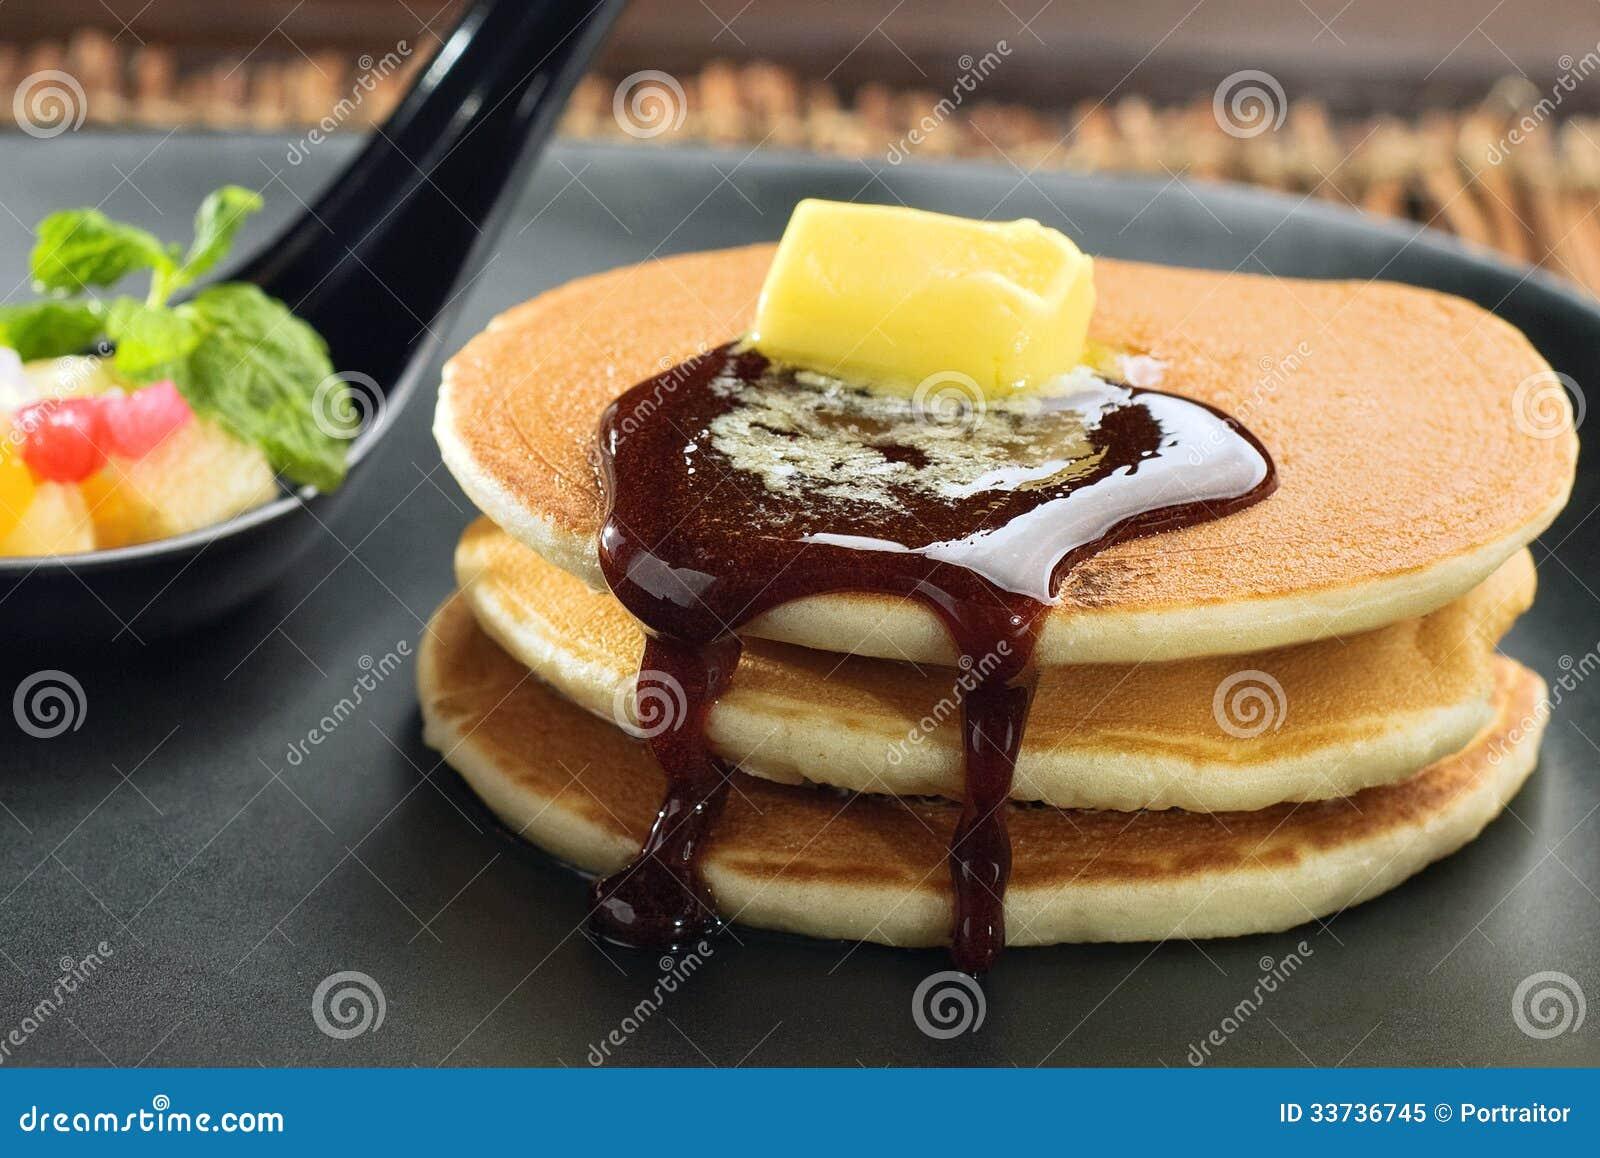 Pannekoek met honing en boter